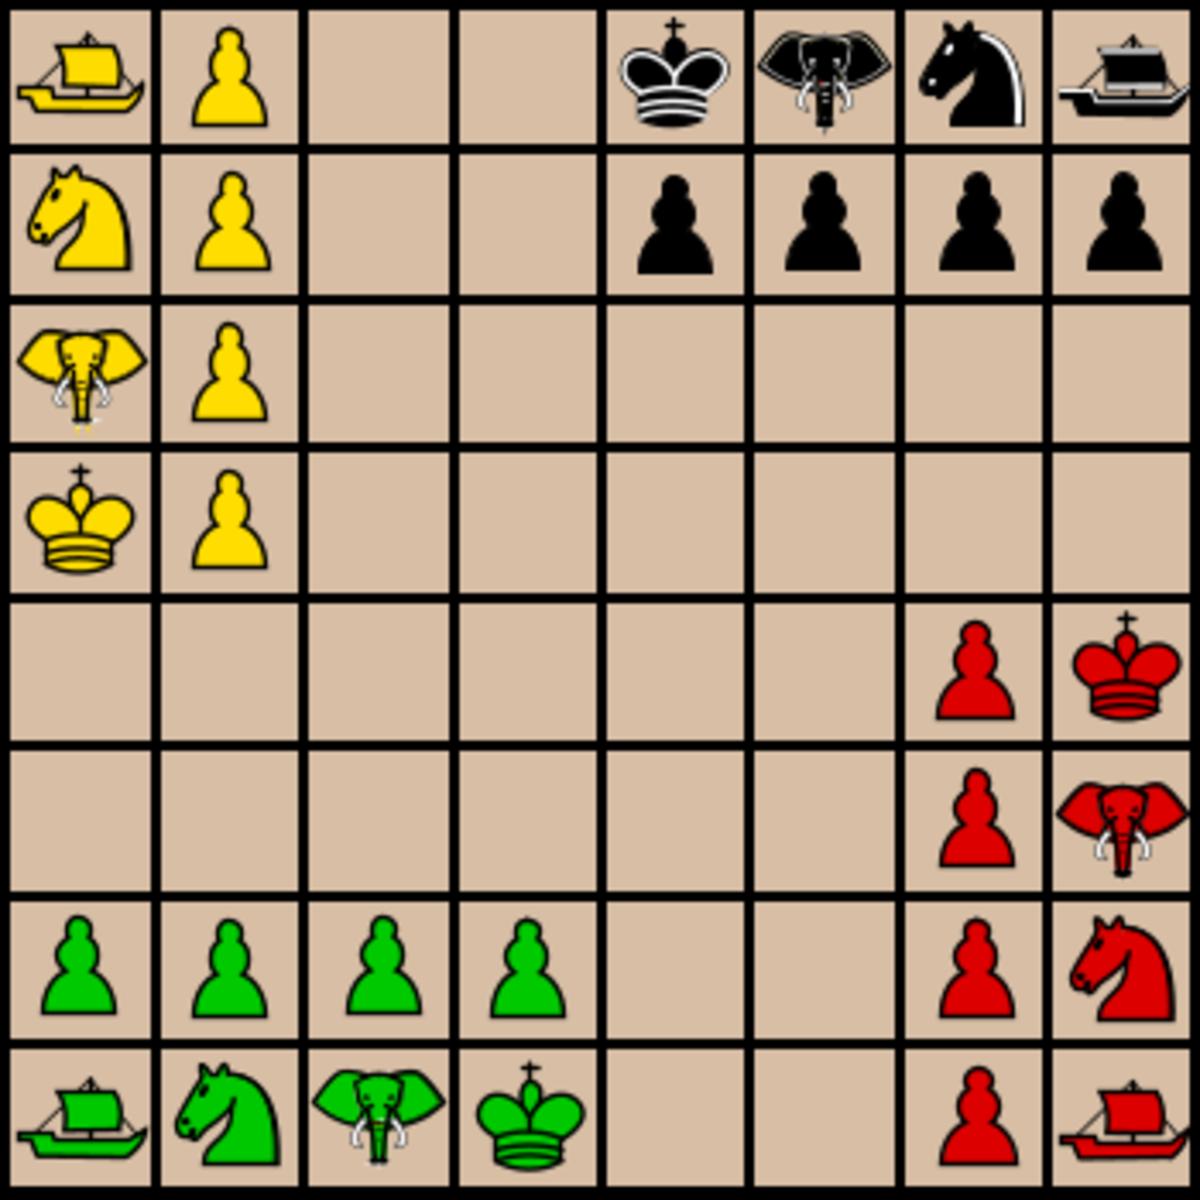 Chaturanga starting positions